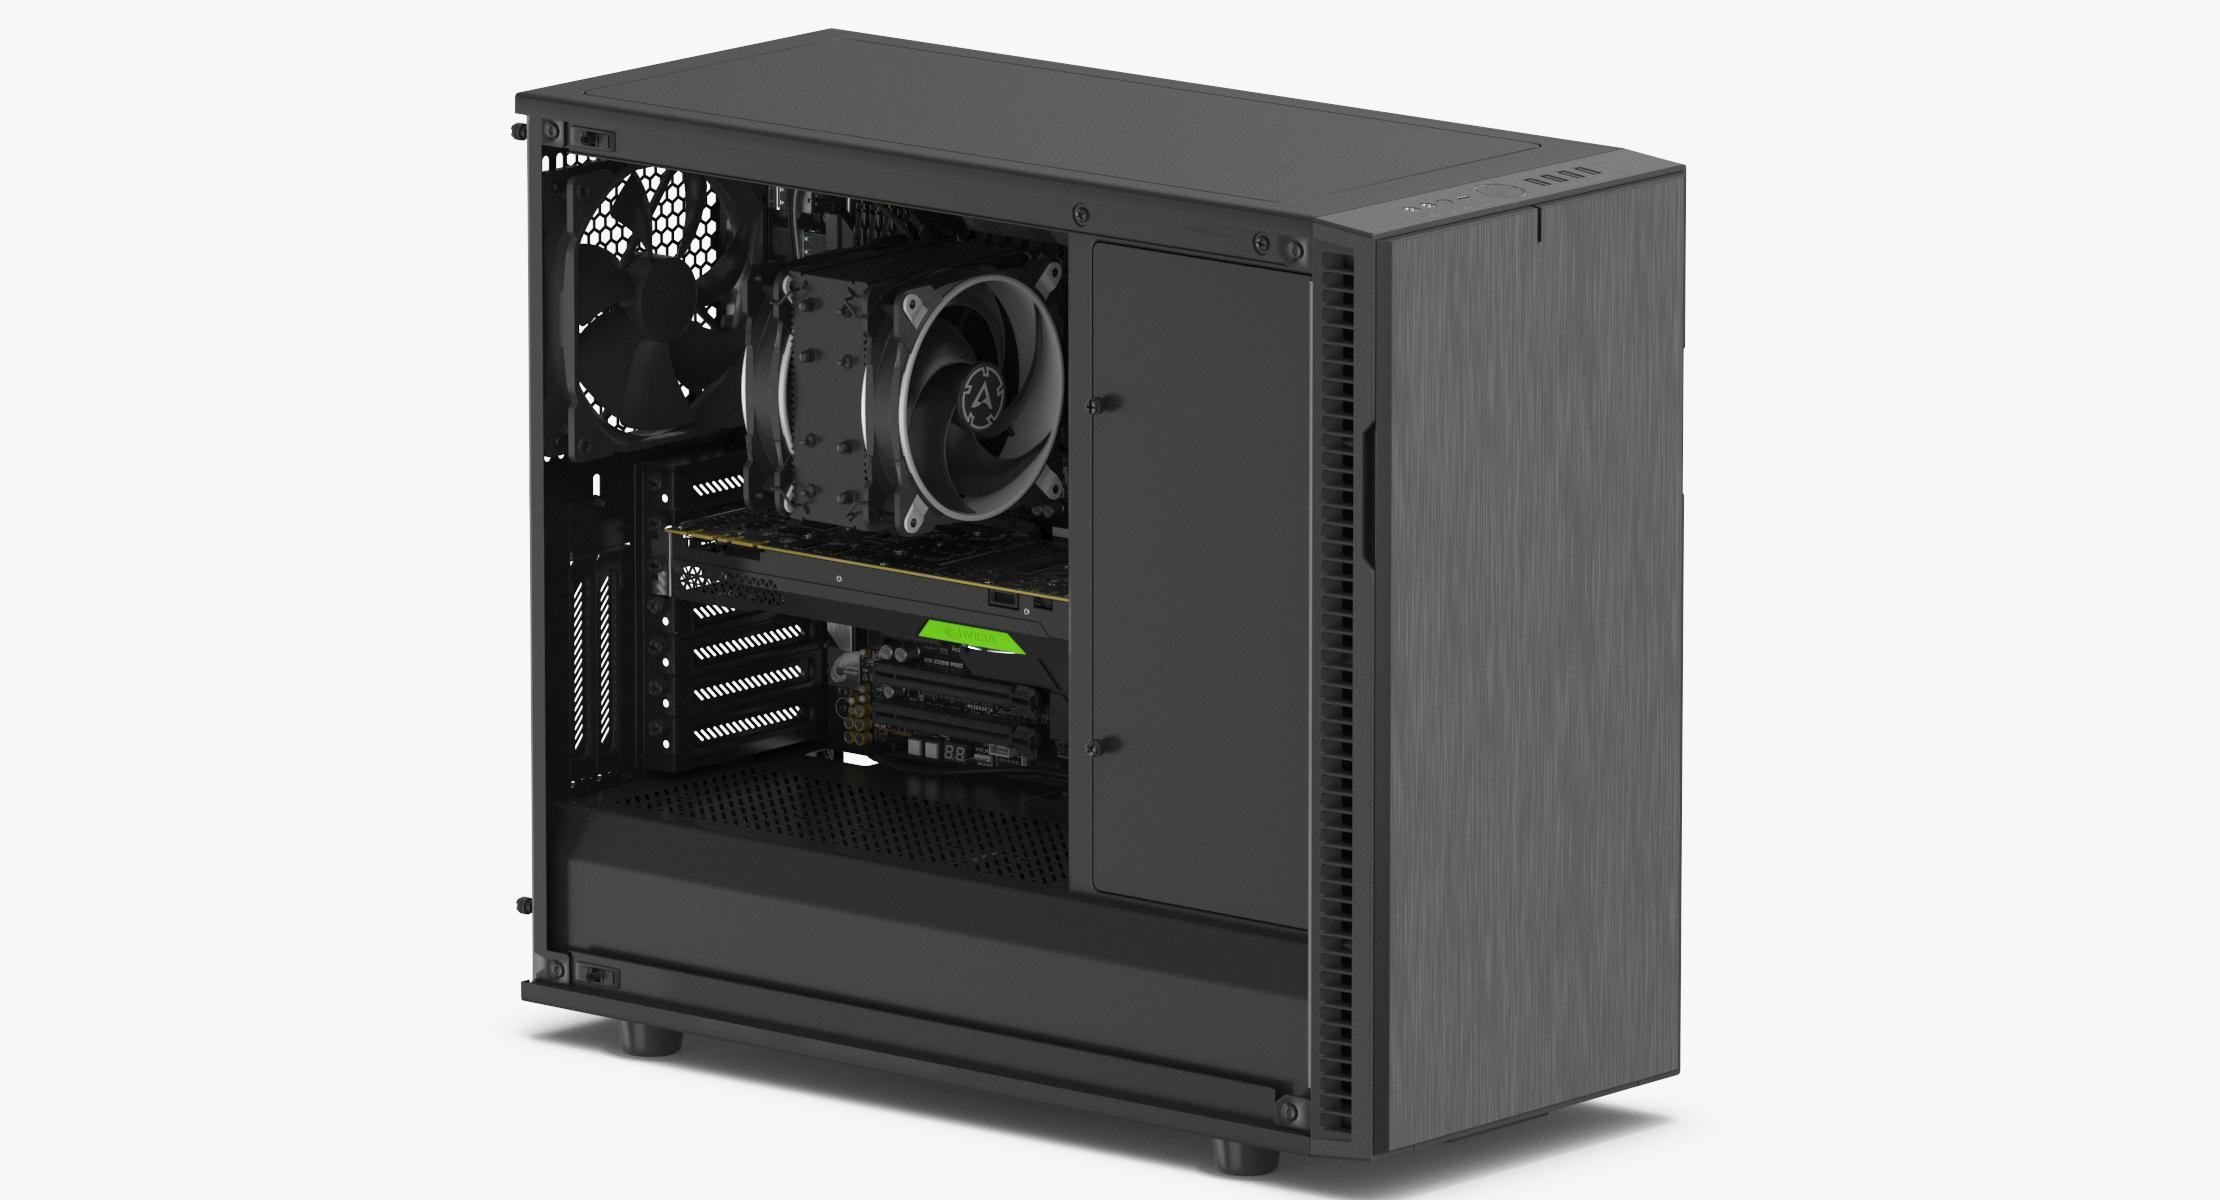 3D Full PC Case Open model - reel 1